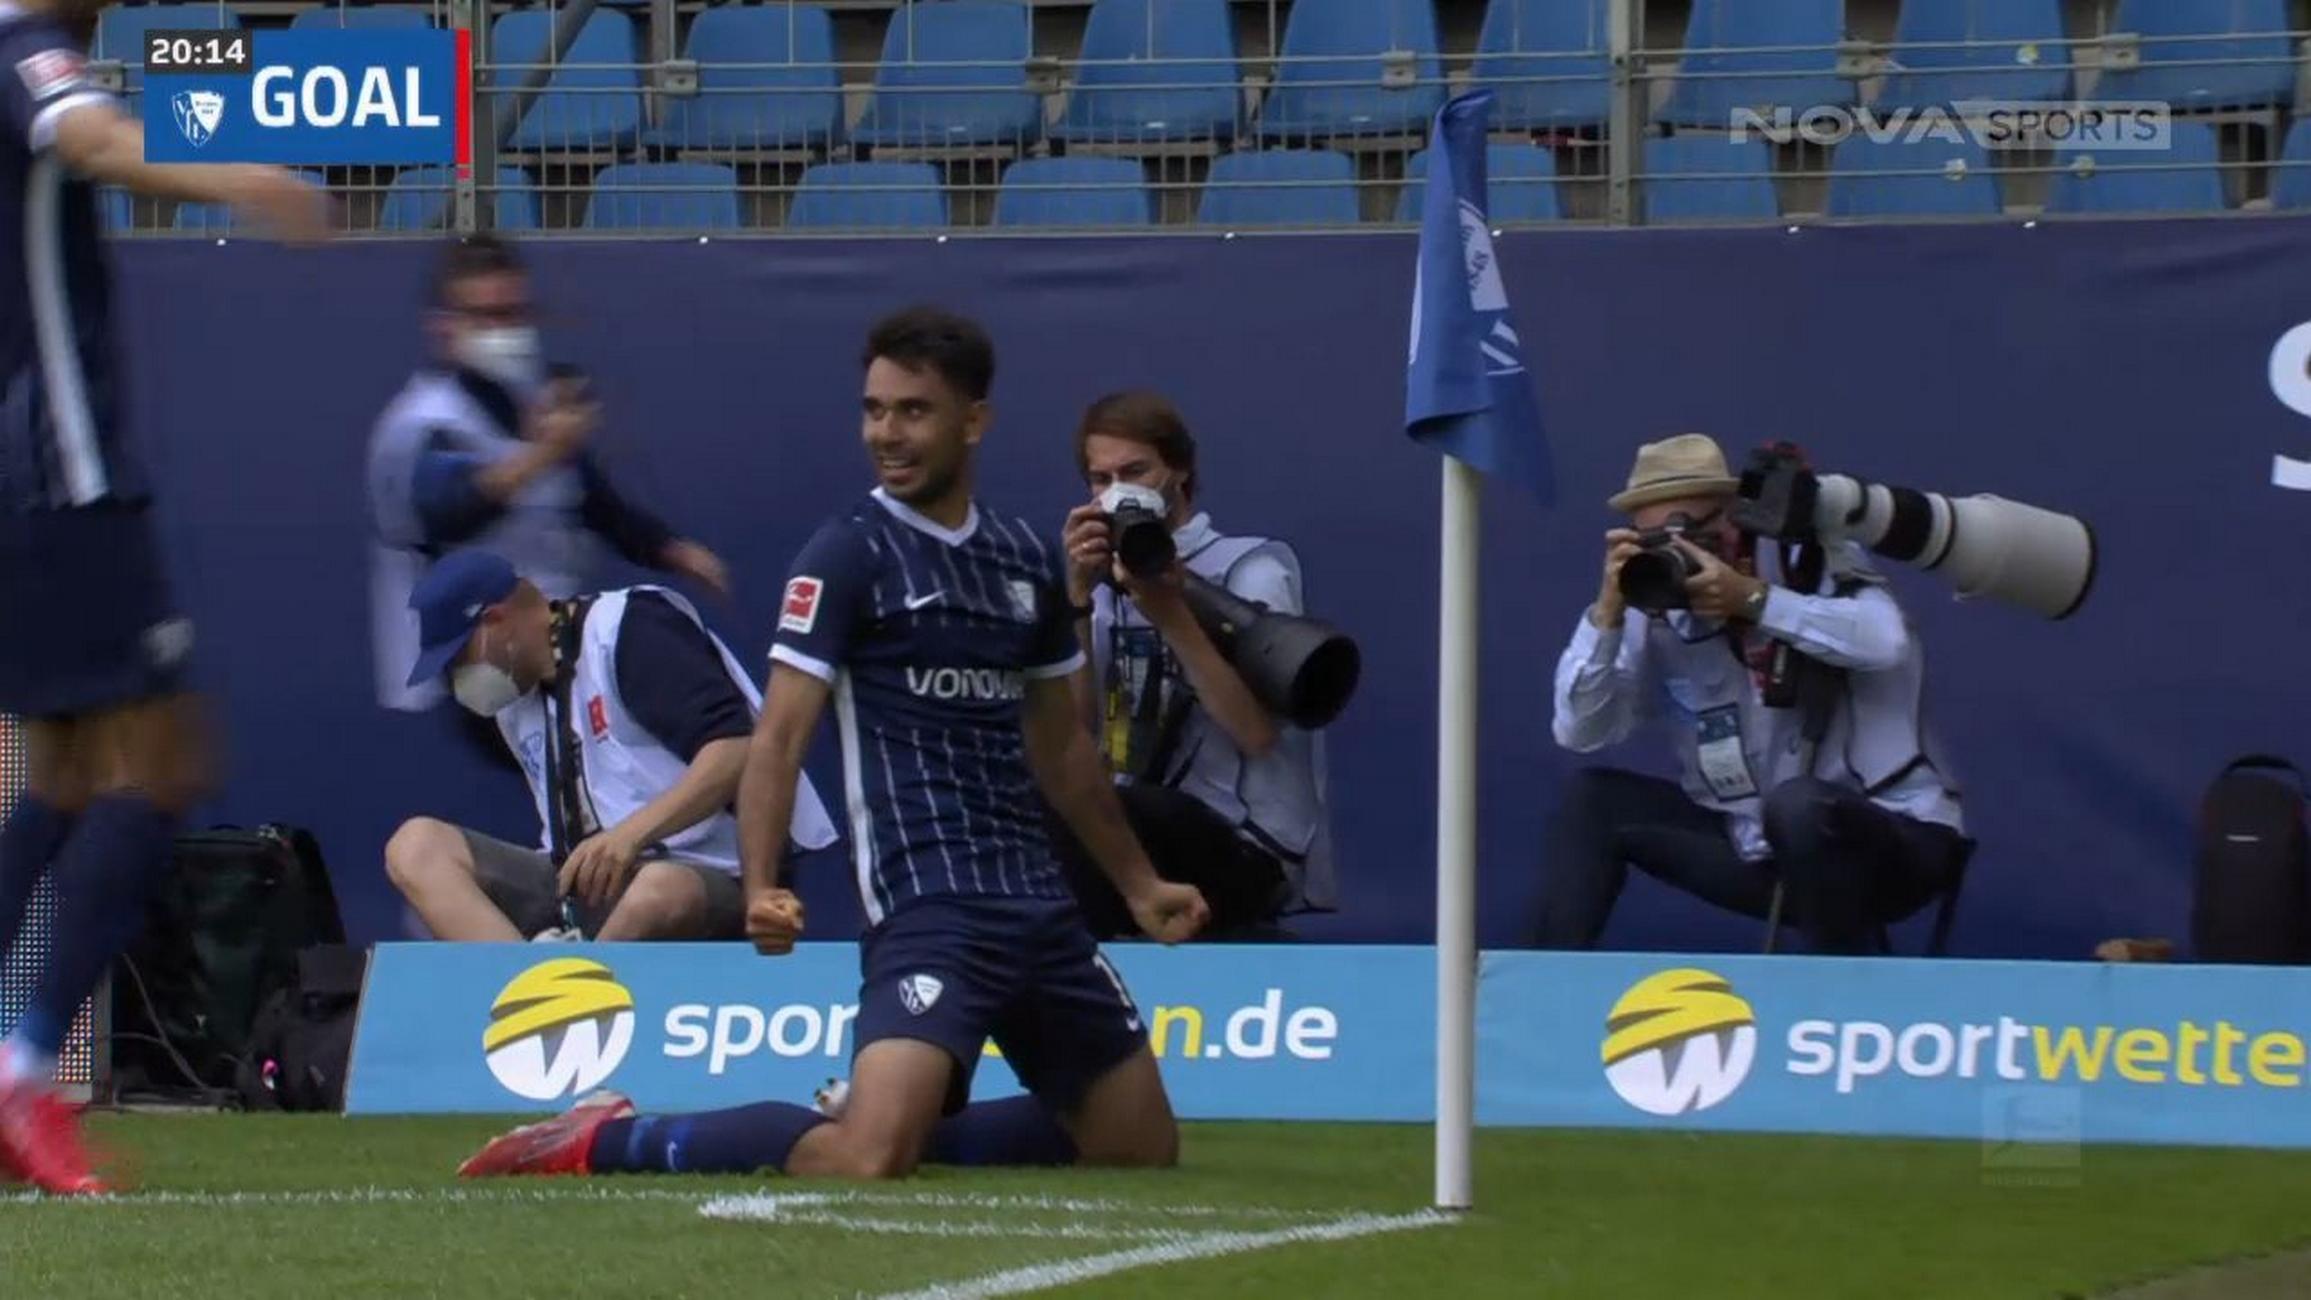 Bundesliga – Έκανε τον Μέσι: Τρομερό γκολ με σλάλομ απέναντι σε 6 παίκτες